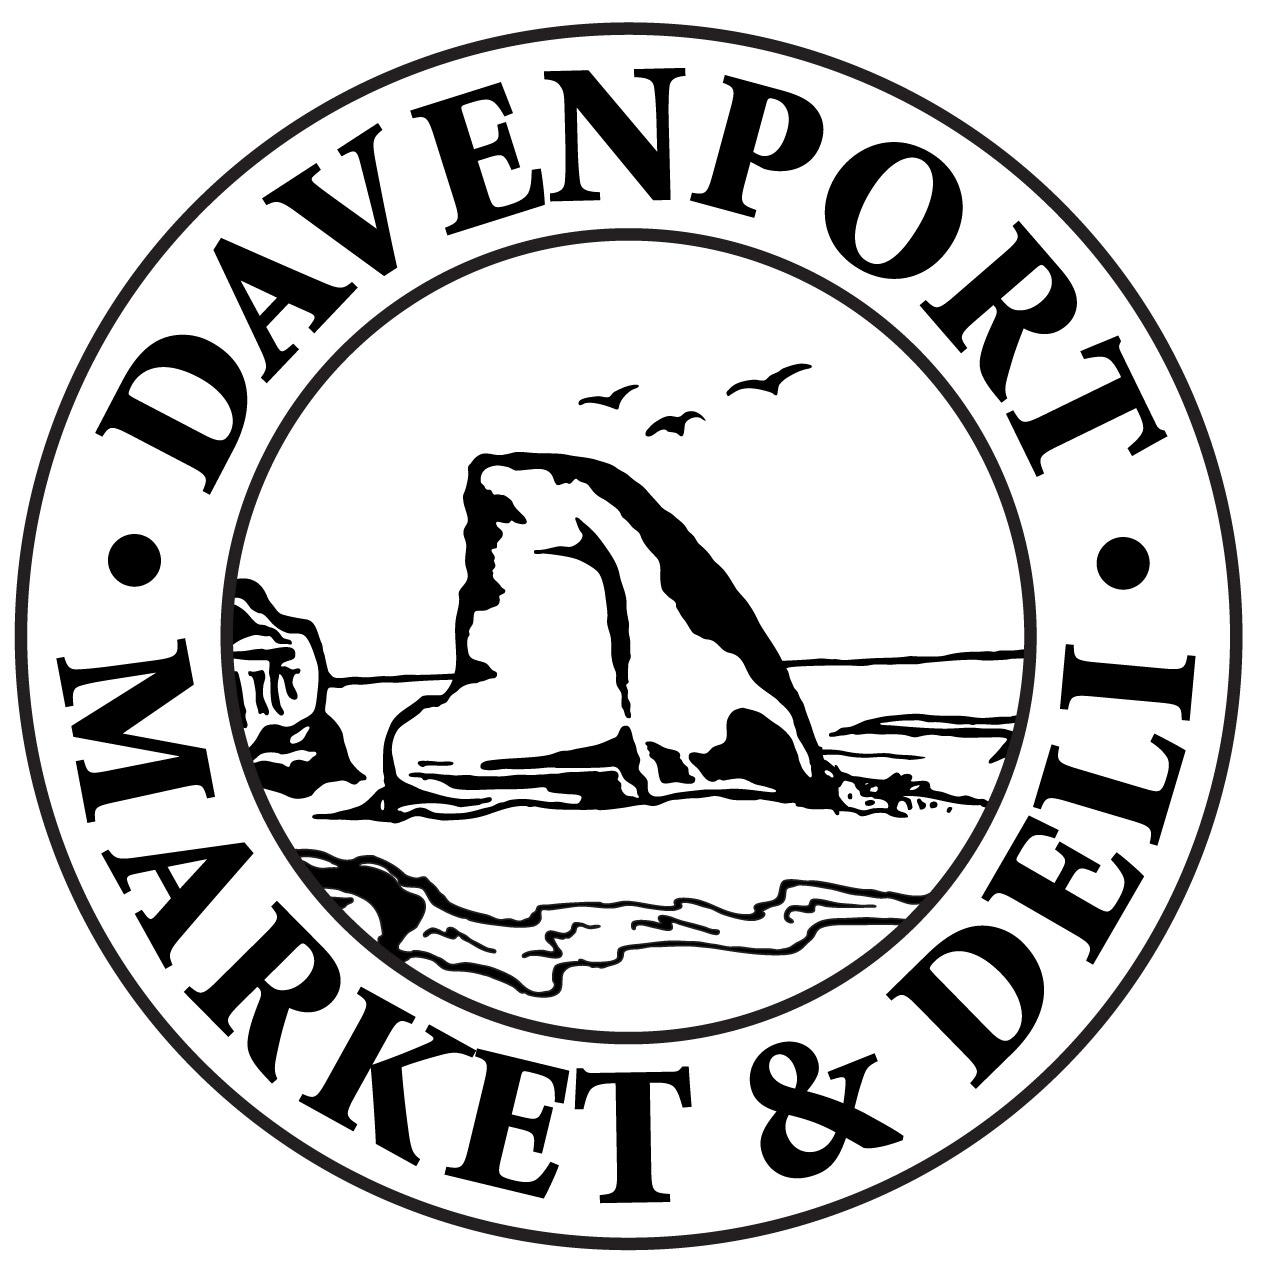 Davenport Deli